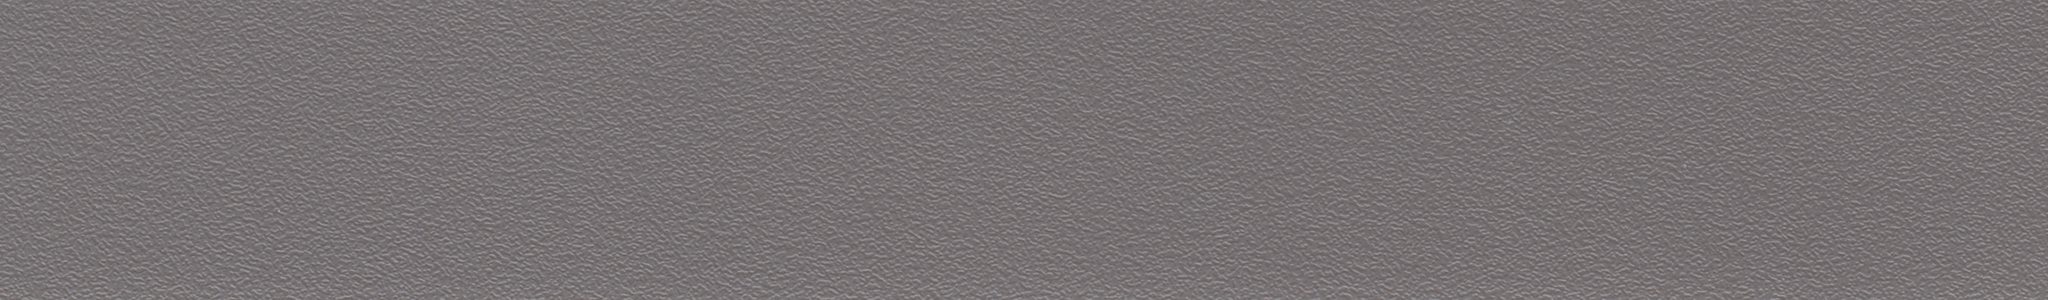 HU 172211 Кромка ABS Лава Серый - Шагрень XG